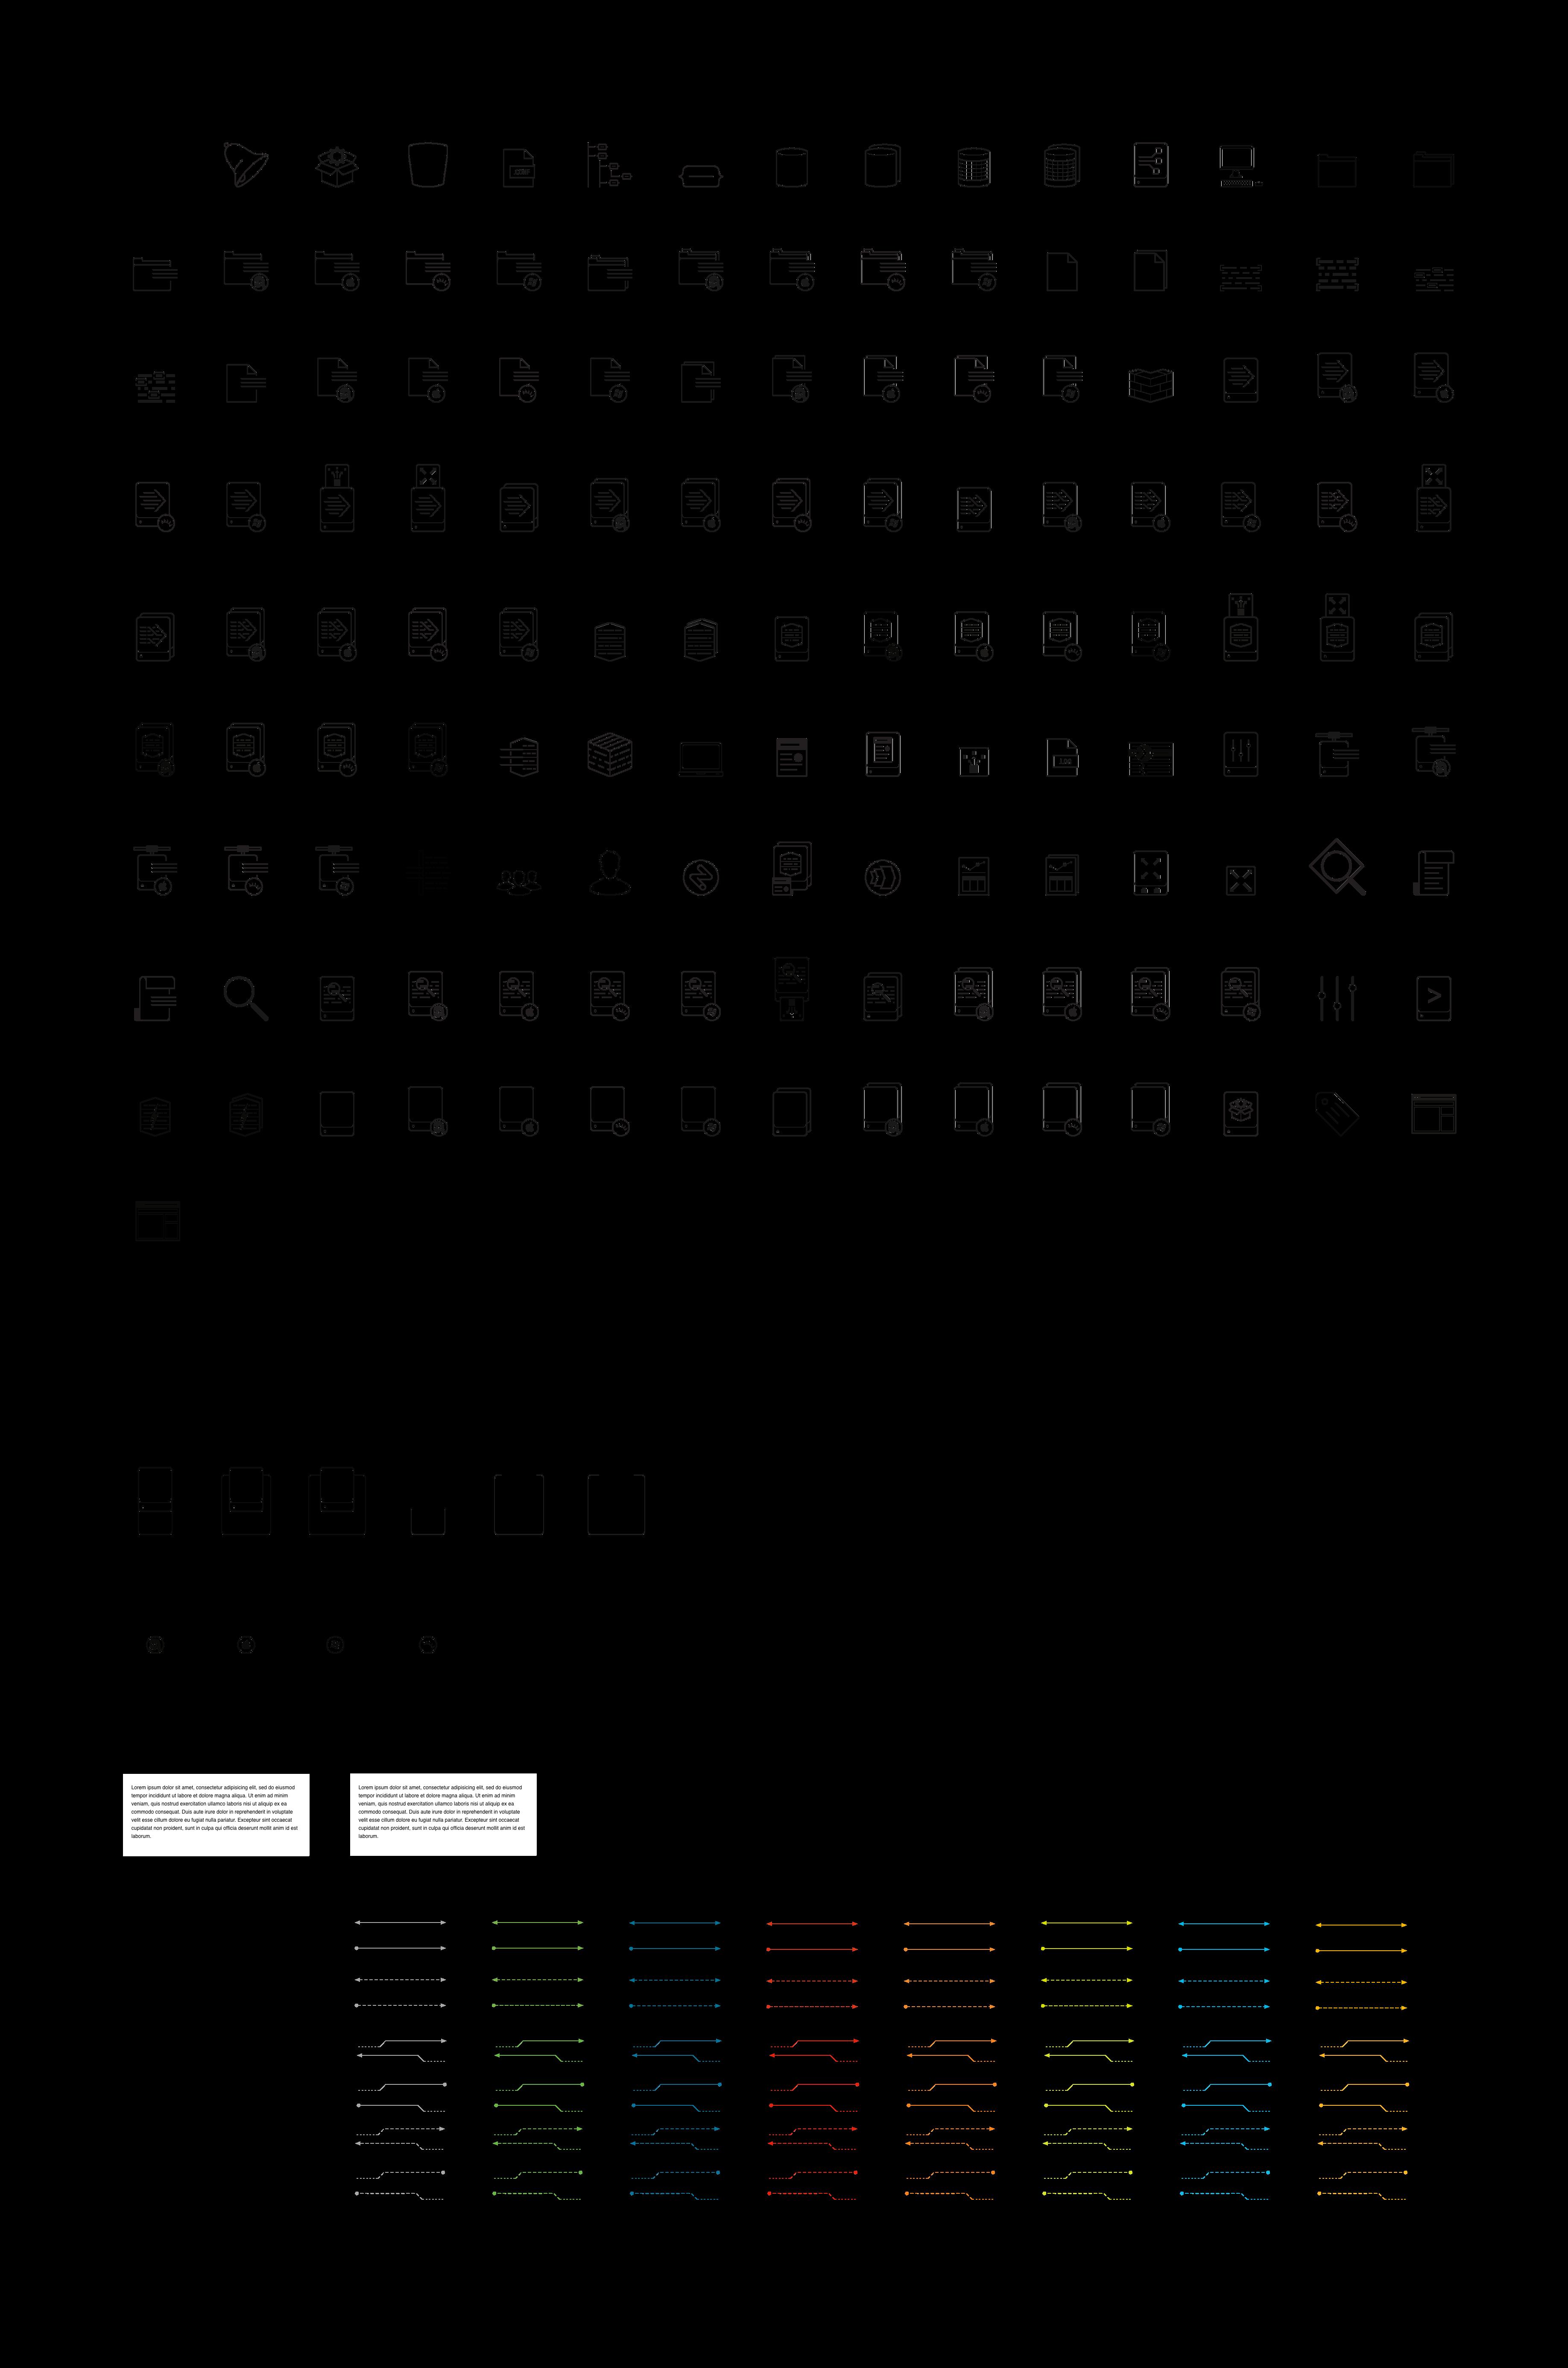 splunk documentation icons